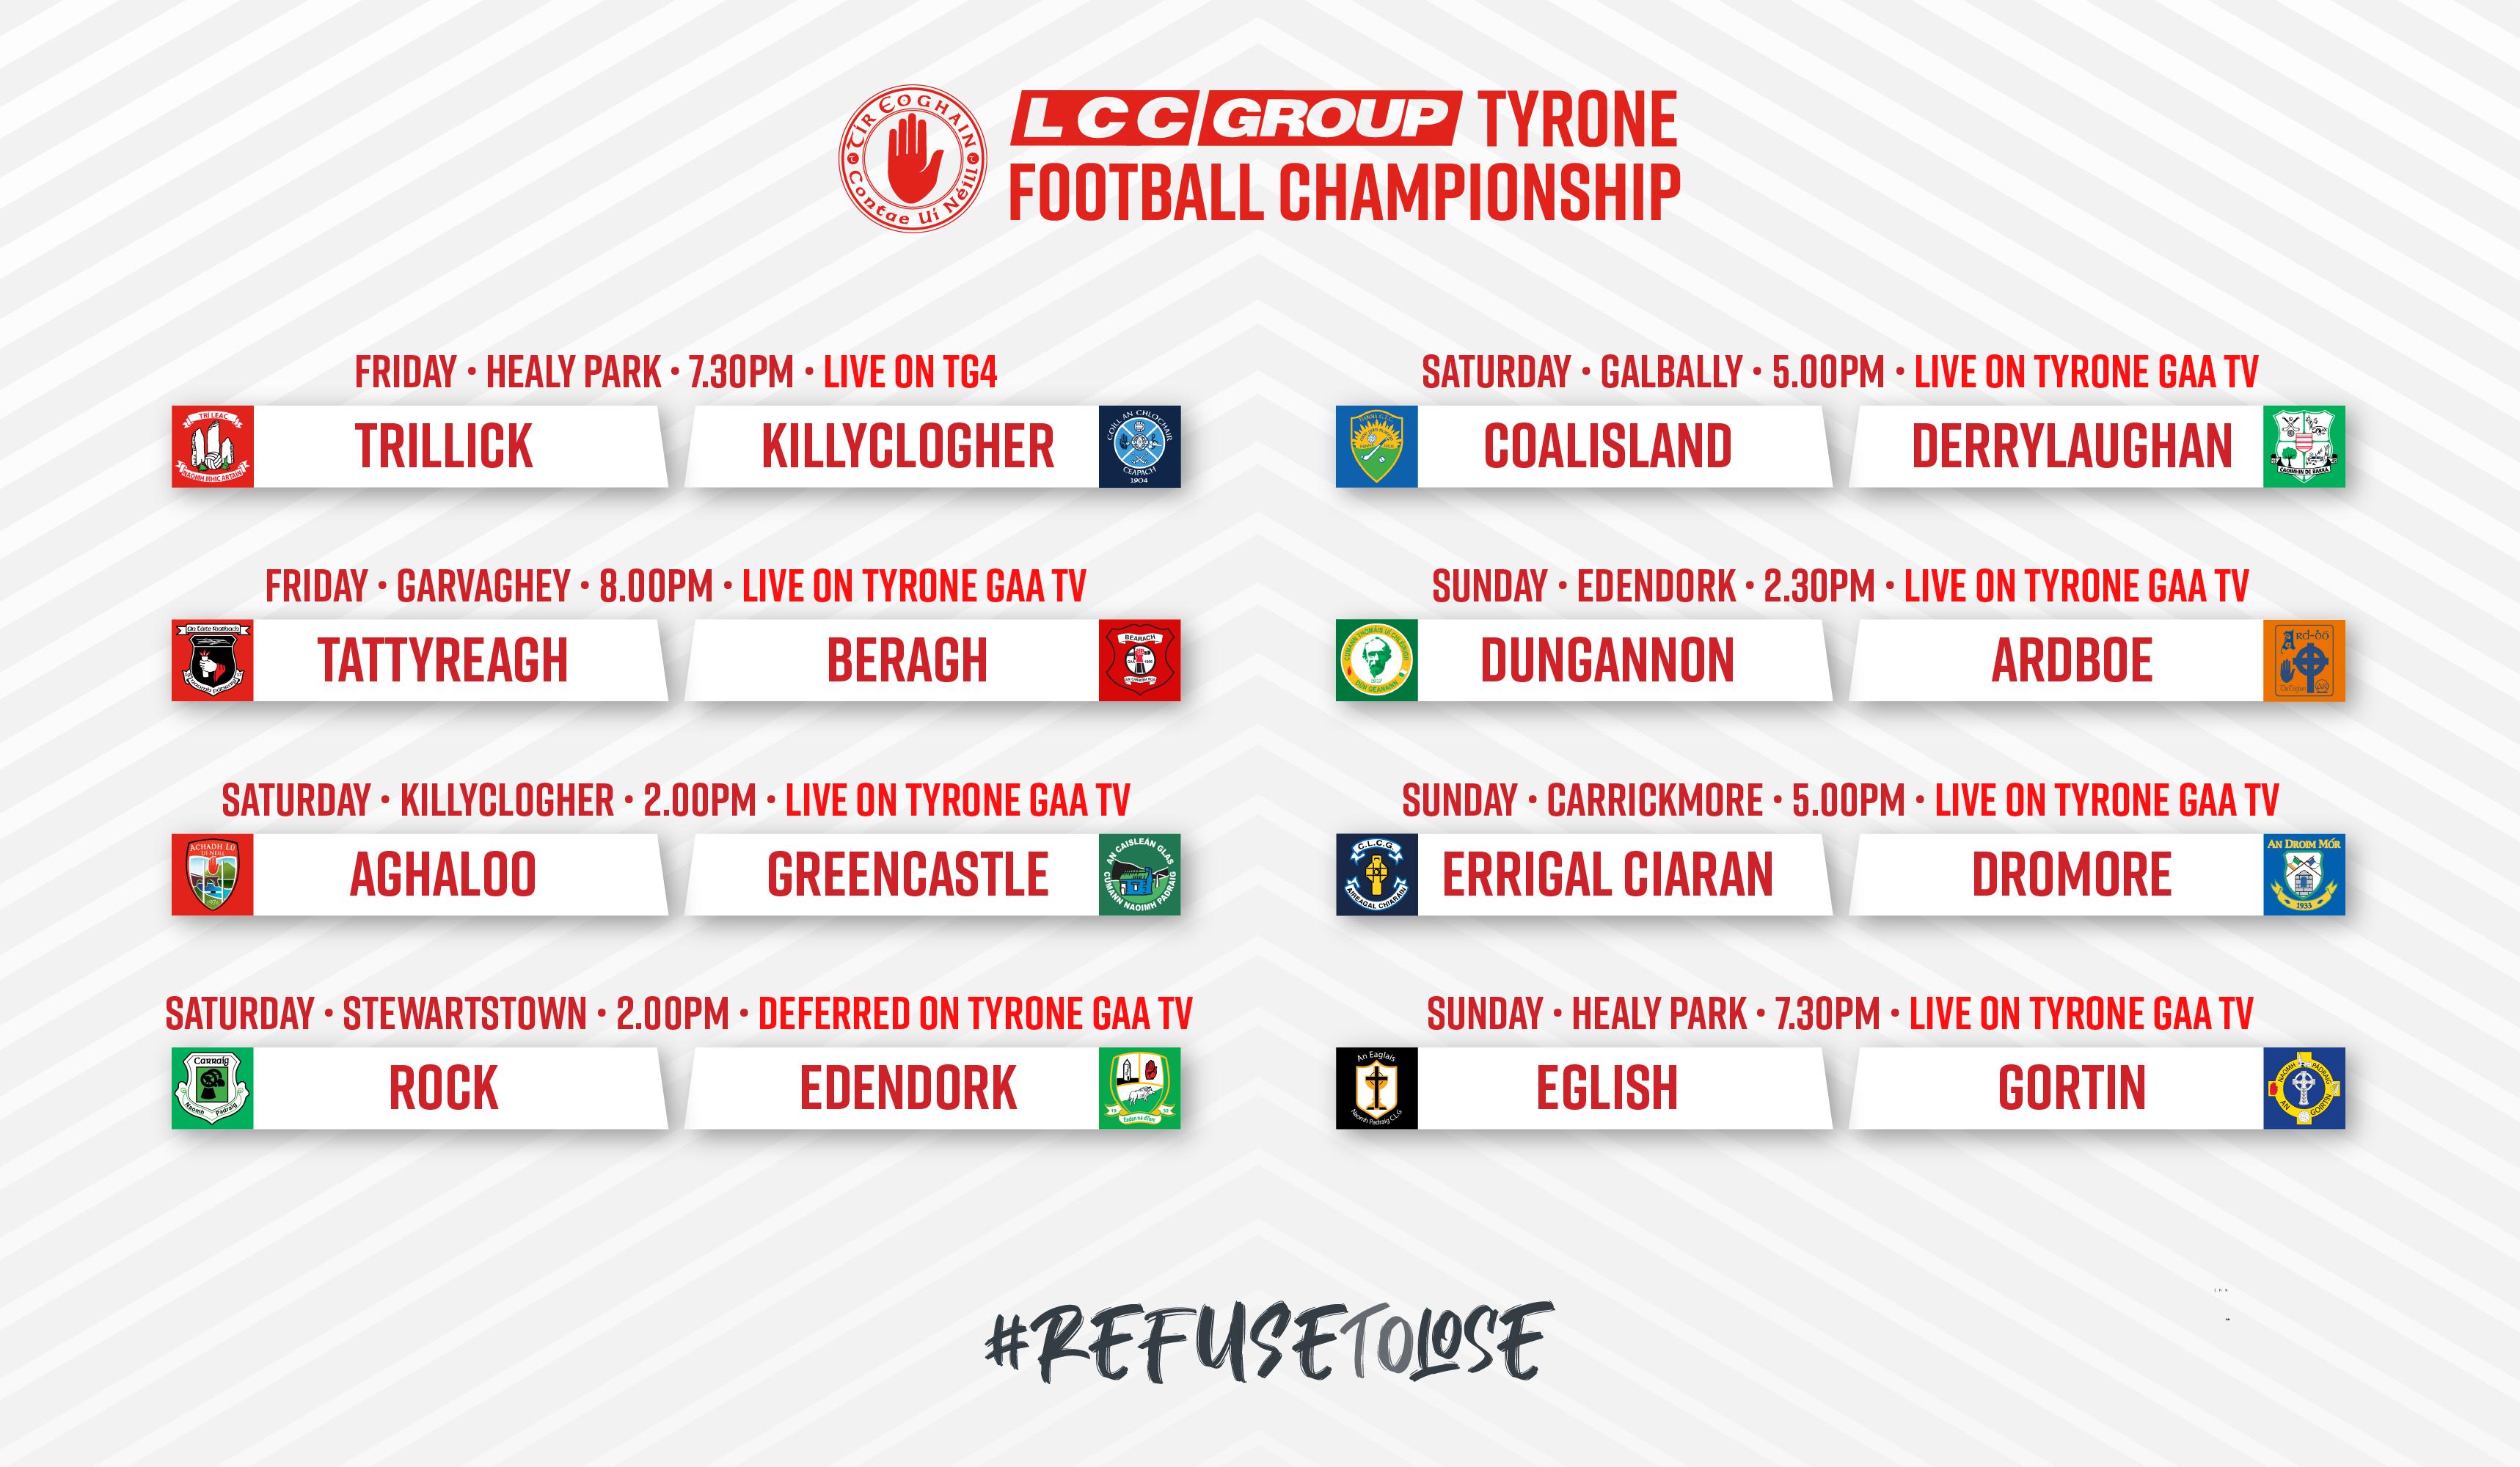 Tyrone GAA TV Fixtures Schedule for Senior & Intermediate LCC Group Championship Q/Finals